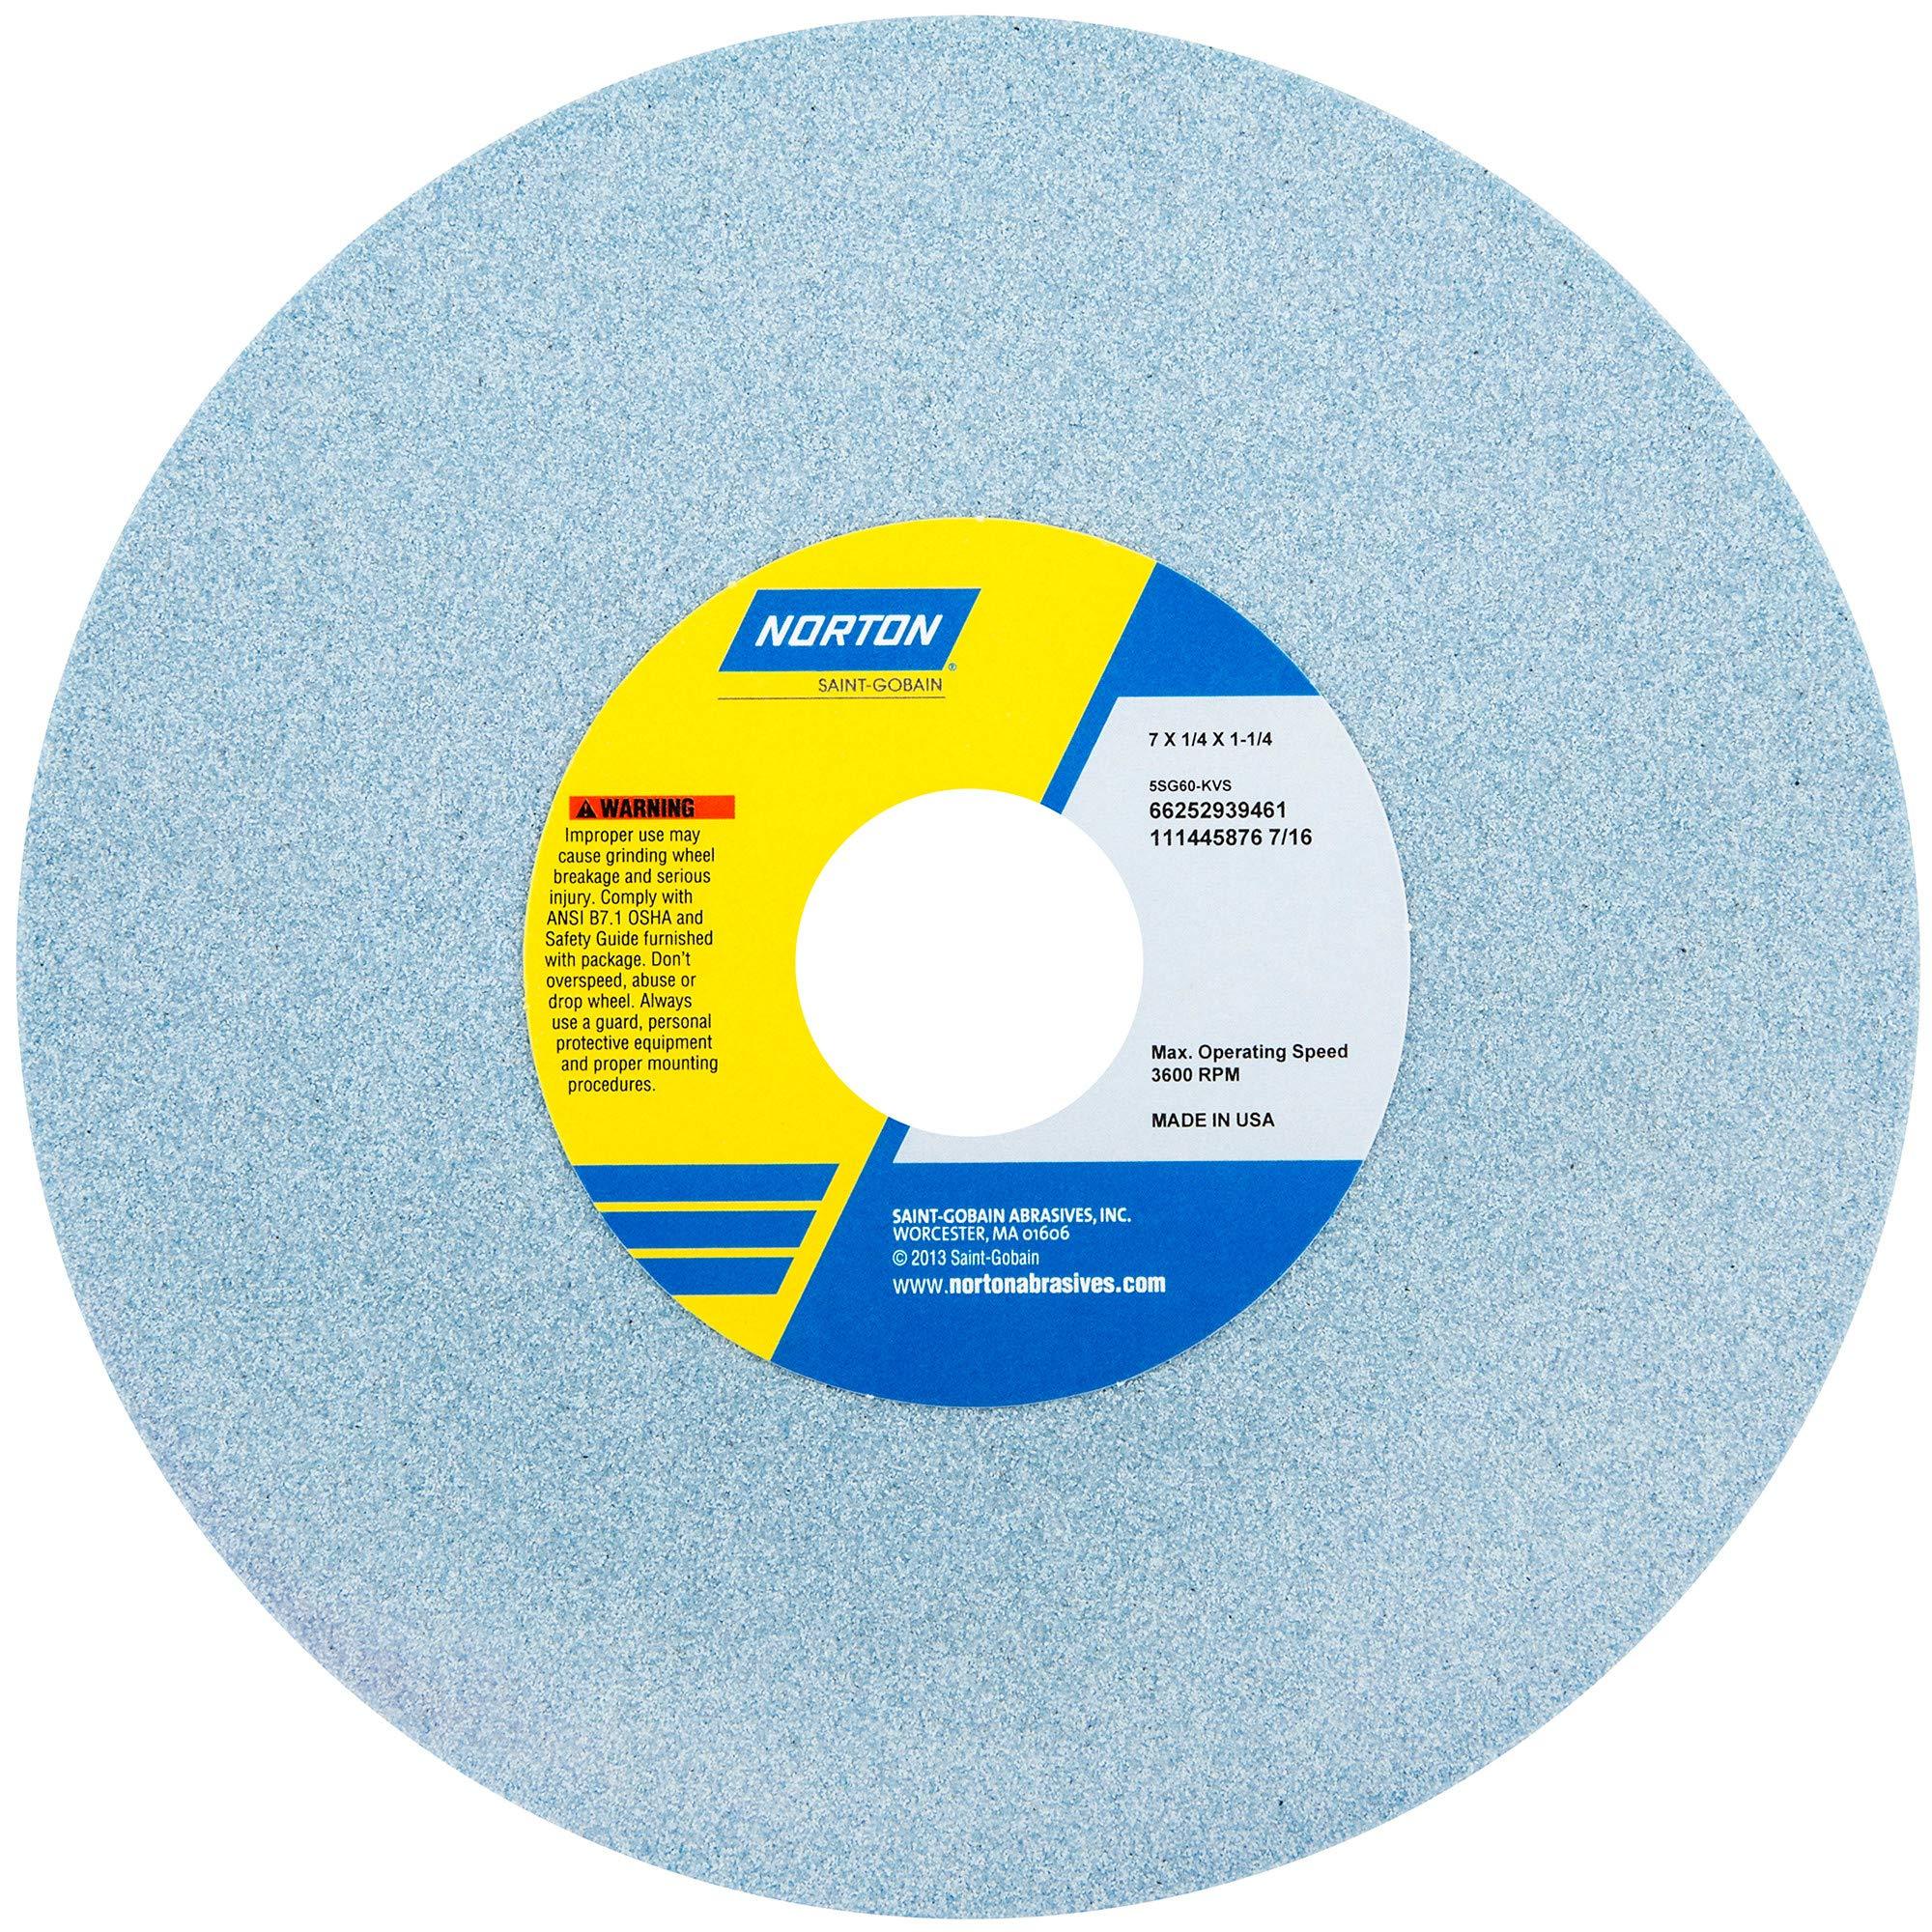 Norton 5SG60-KVS Type 01 Vitrified Straight Toolroom Grinding Wheel, Ceramic Alumina, 7'' Diameter x 1/4'' Width, 1-1/4'' Arbor, 60 Grit, Grade K, Blue (Pack of 1) by Norton Abrasives - St. Gobain